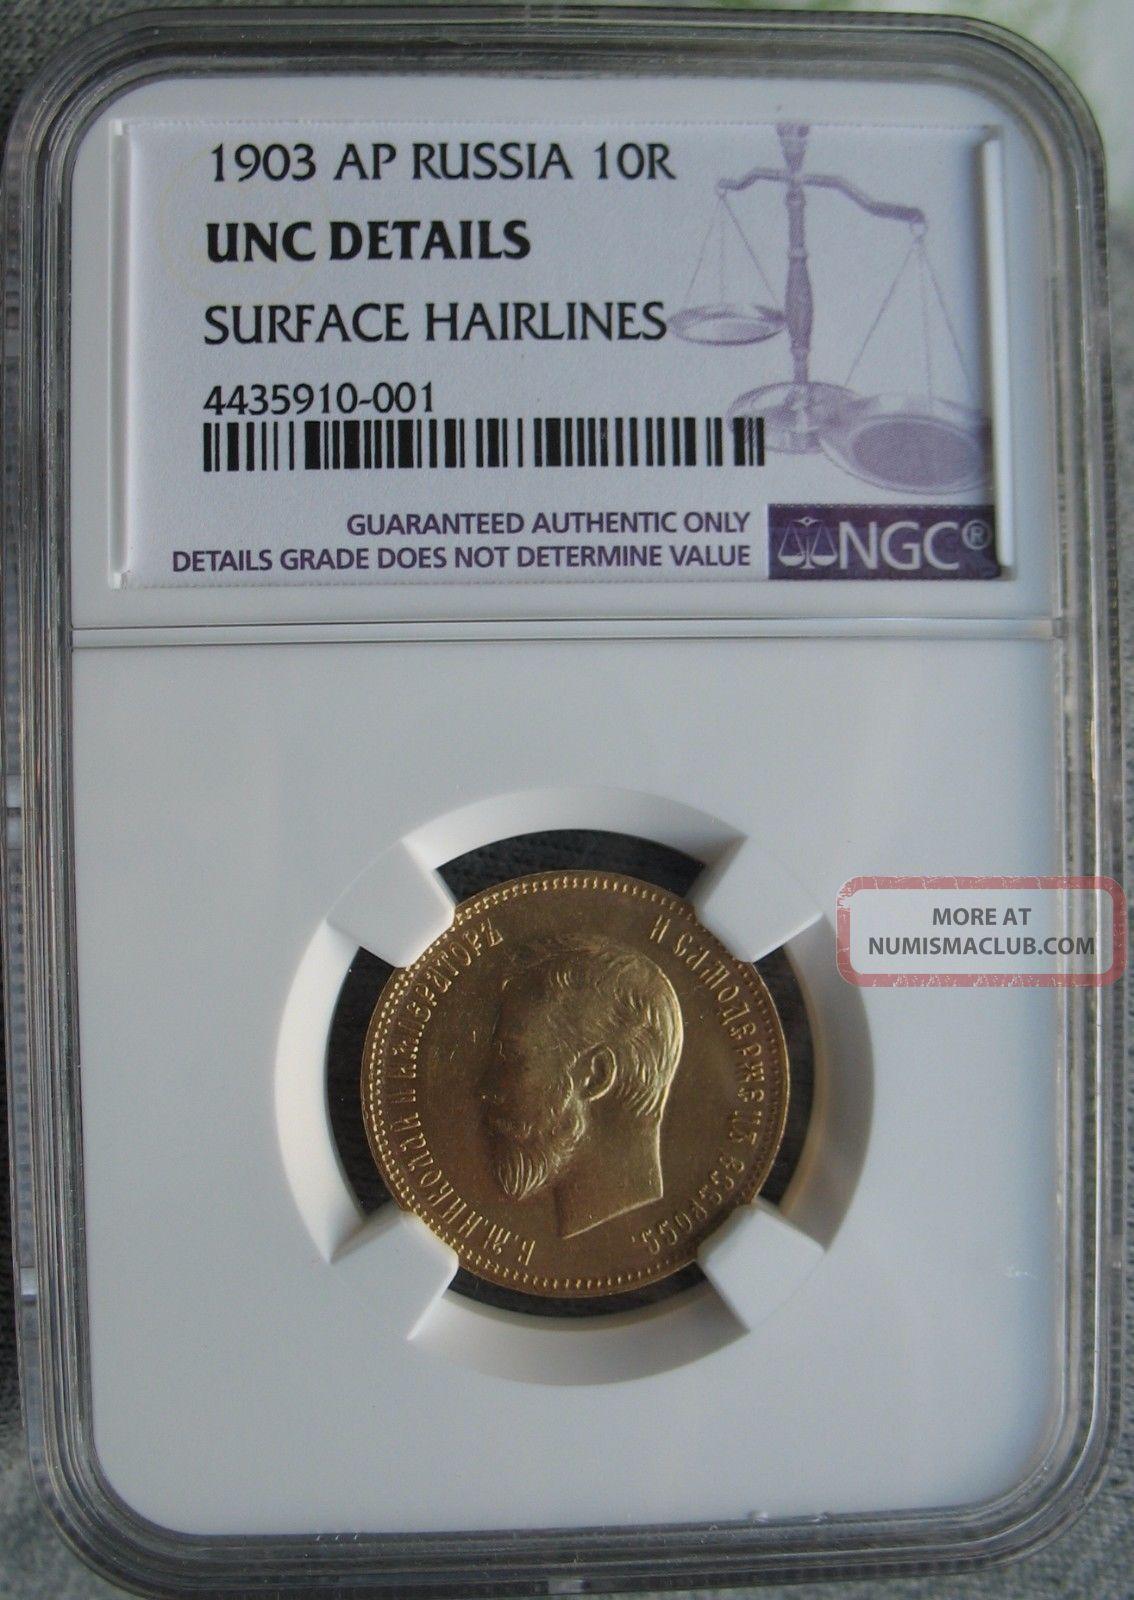 Russia 1903 Ap Gold 10 Roubles Ngc Unc - Details Nicholas Ii Coins: World photo